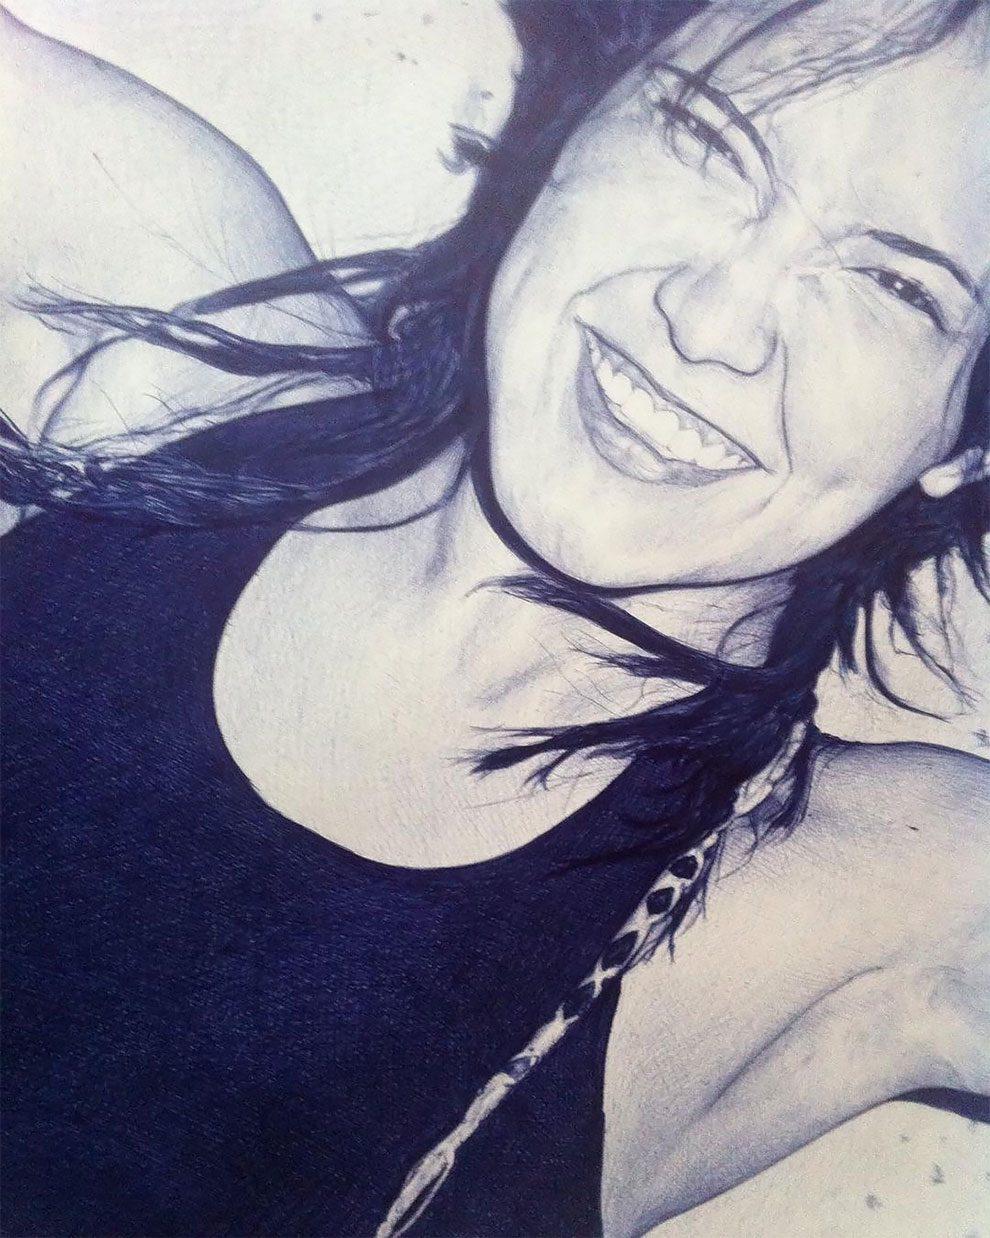 disegni-penna-biro-iperrealismo-alfredo-chamal-06